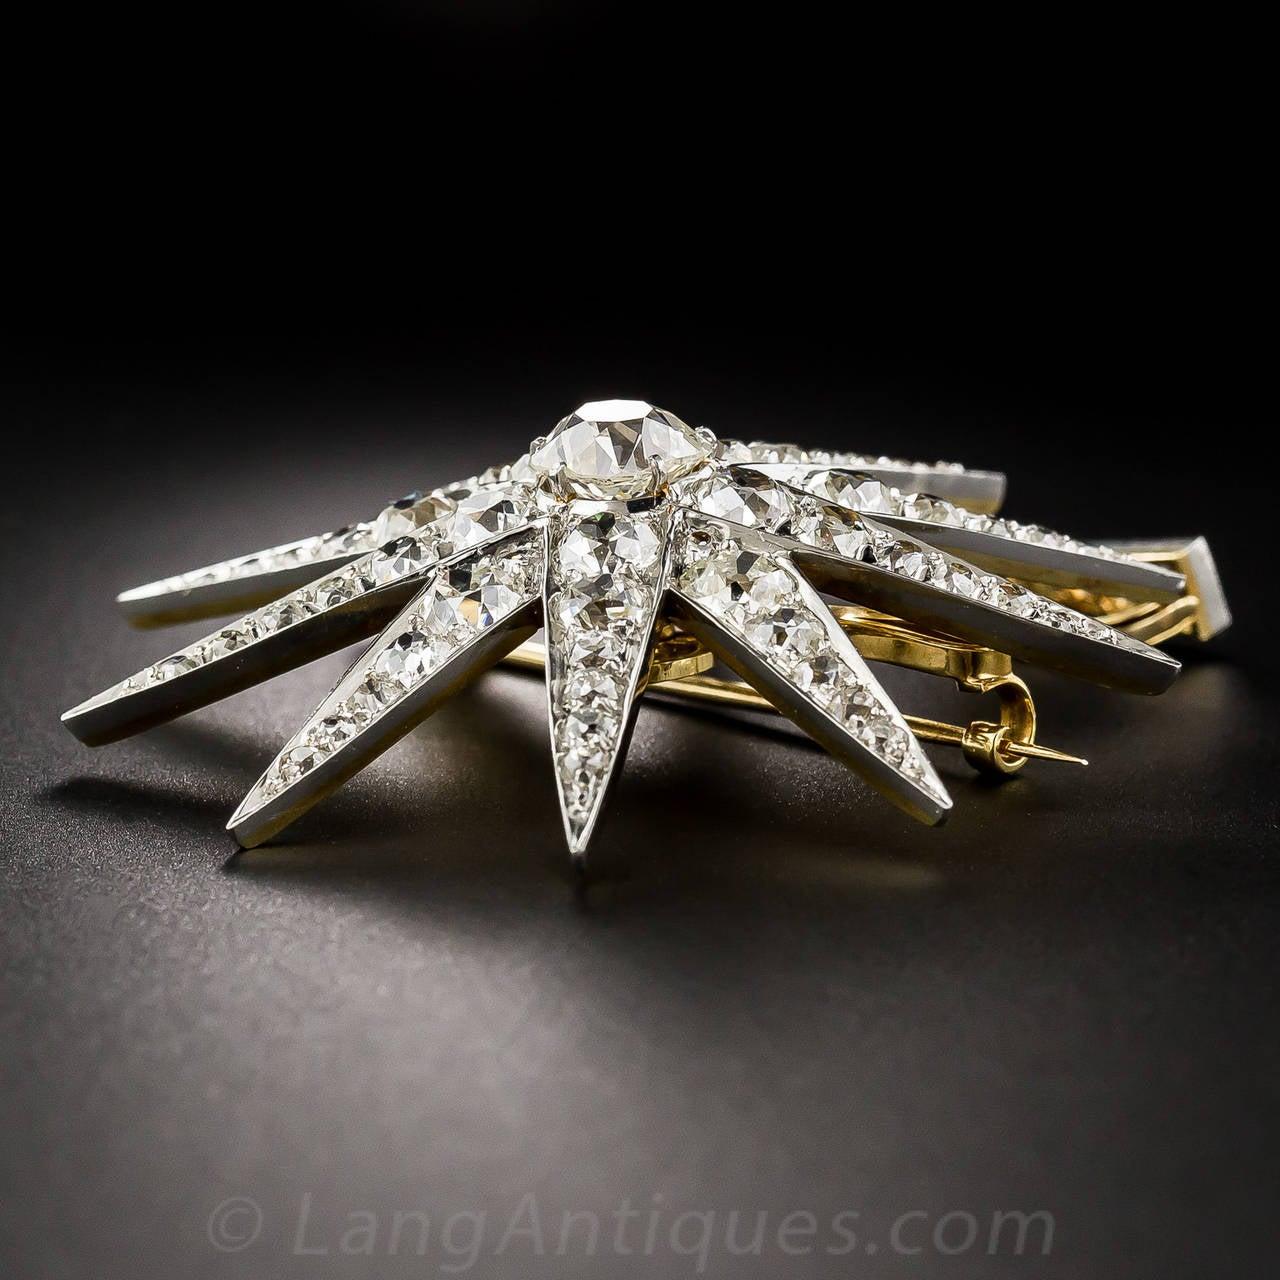 Victorian 2.13 Carat Cushion Cut Diamond Platinum Star Brooch Pendant - GIA Cert 6